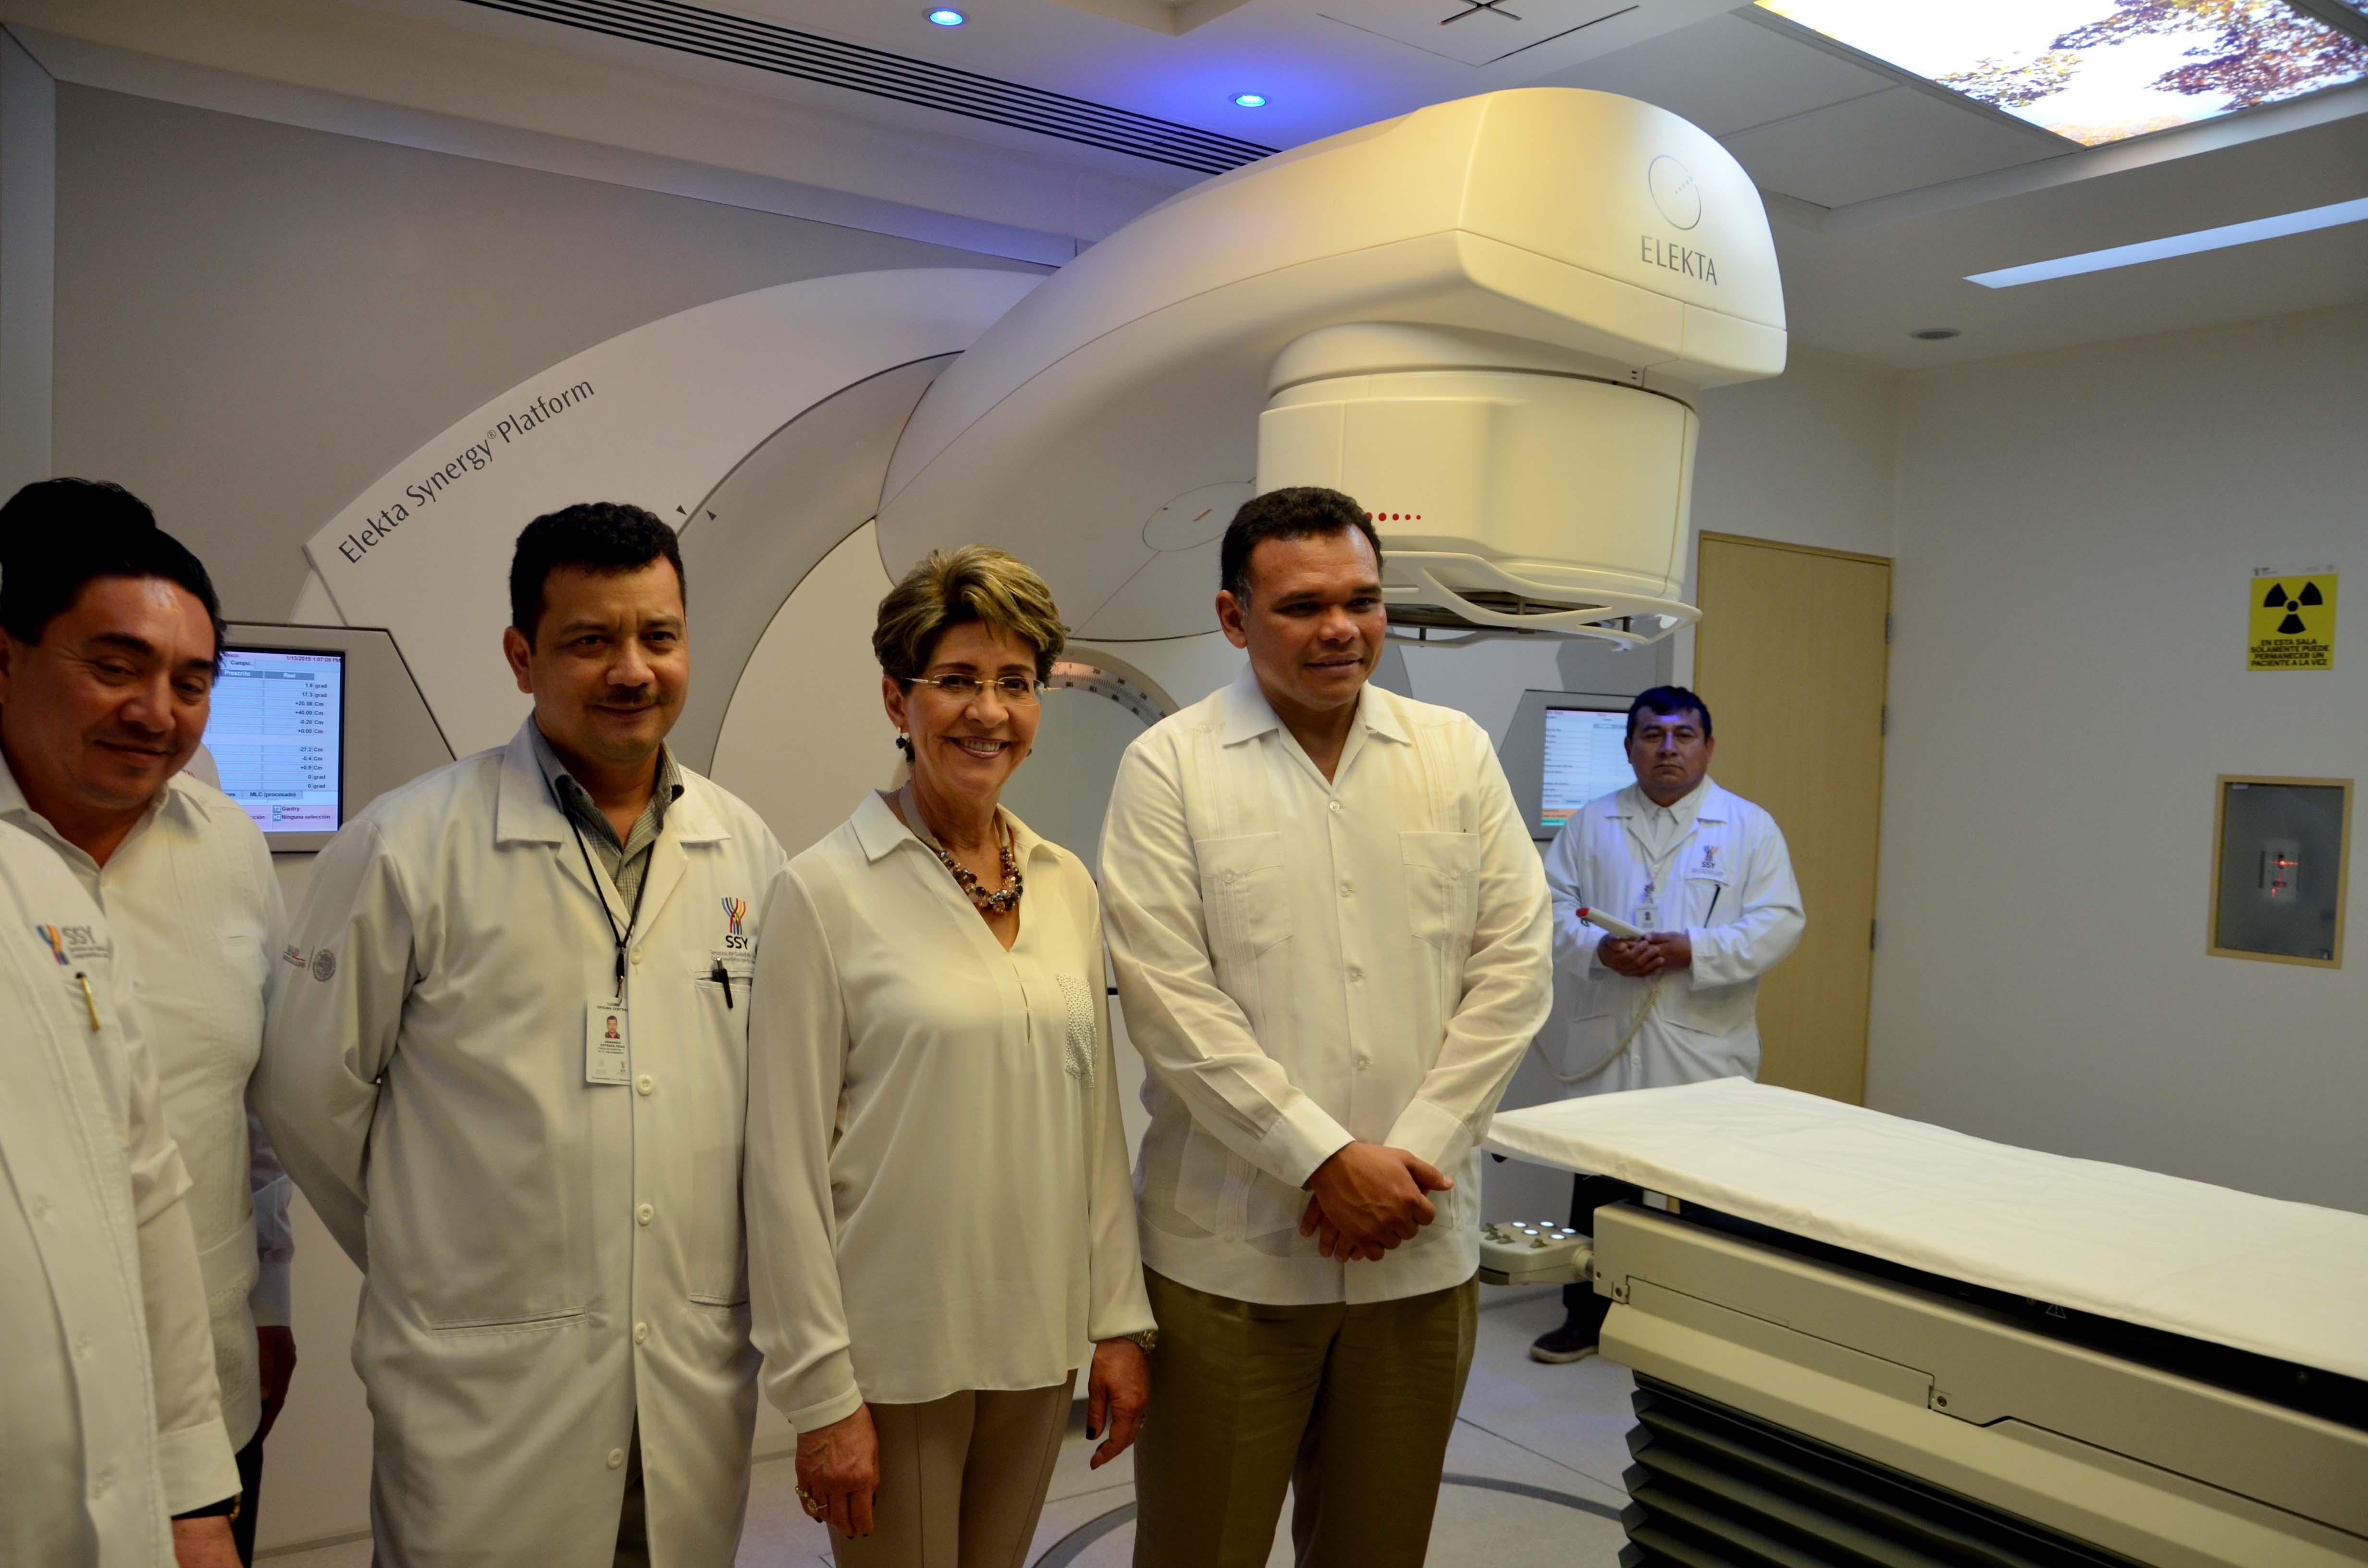 130115 Hospital Dr Agustin OHoran 05jpg